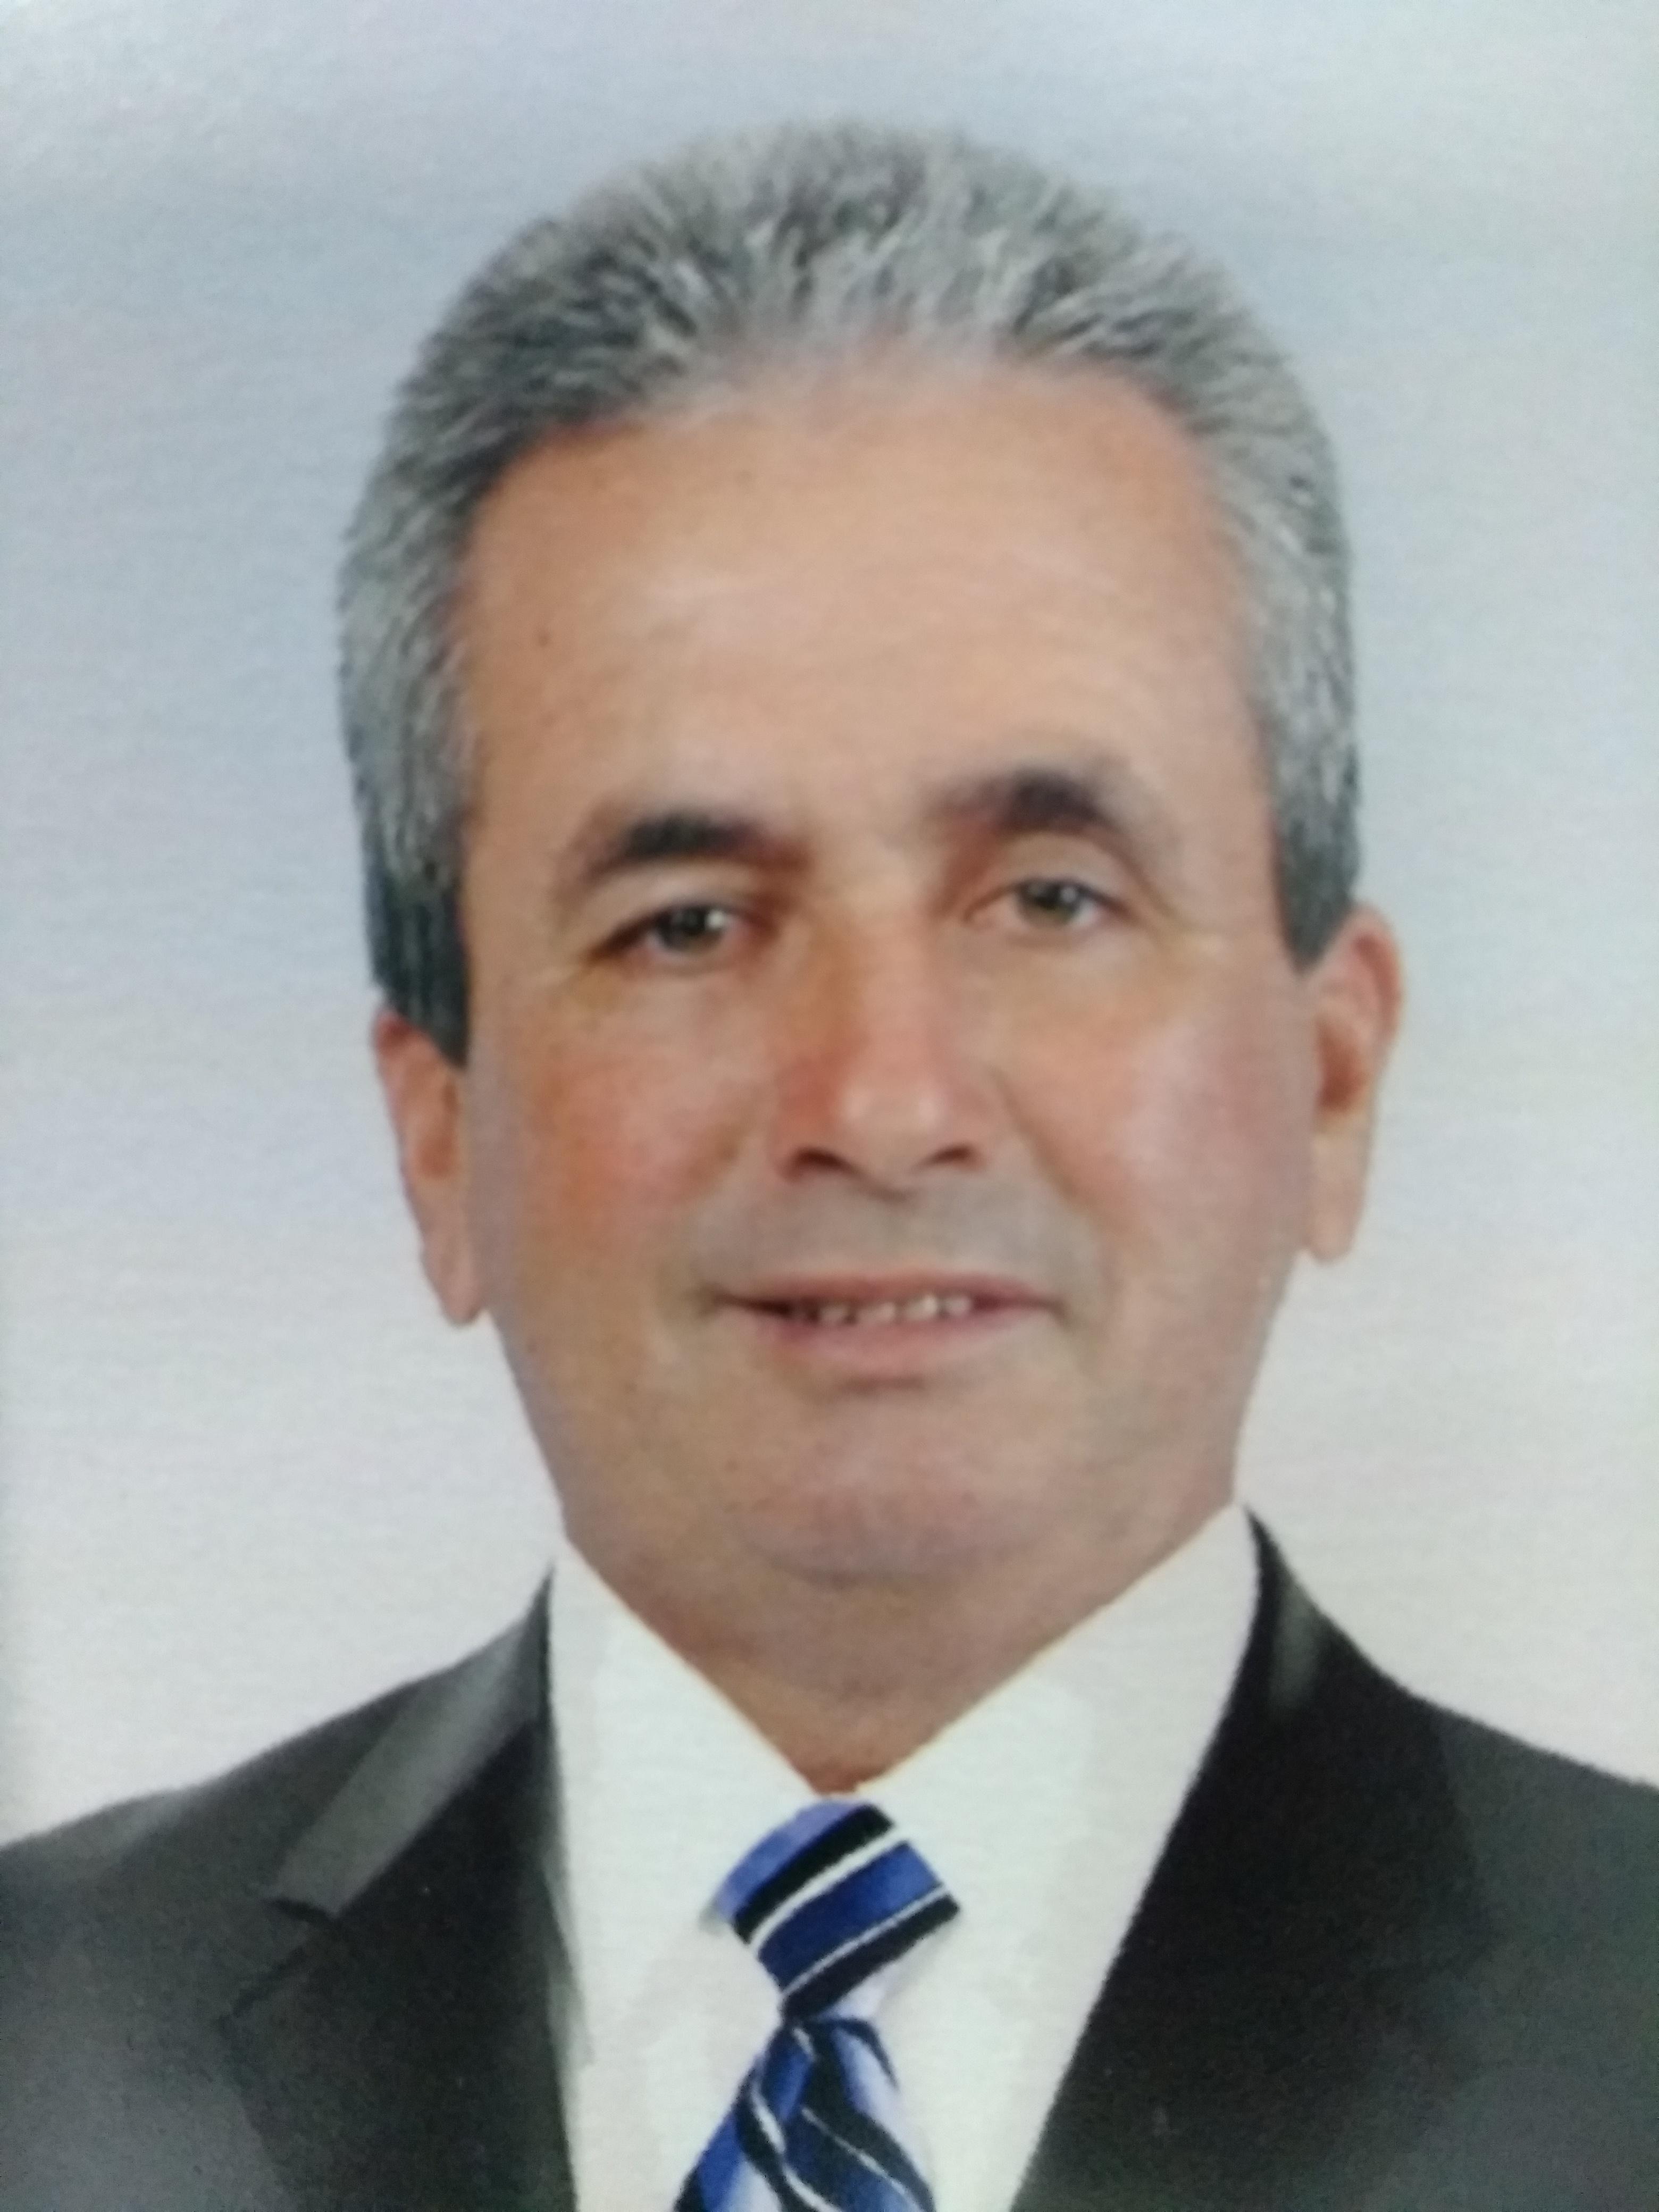 ÉZIO MARQUES FERREIRA